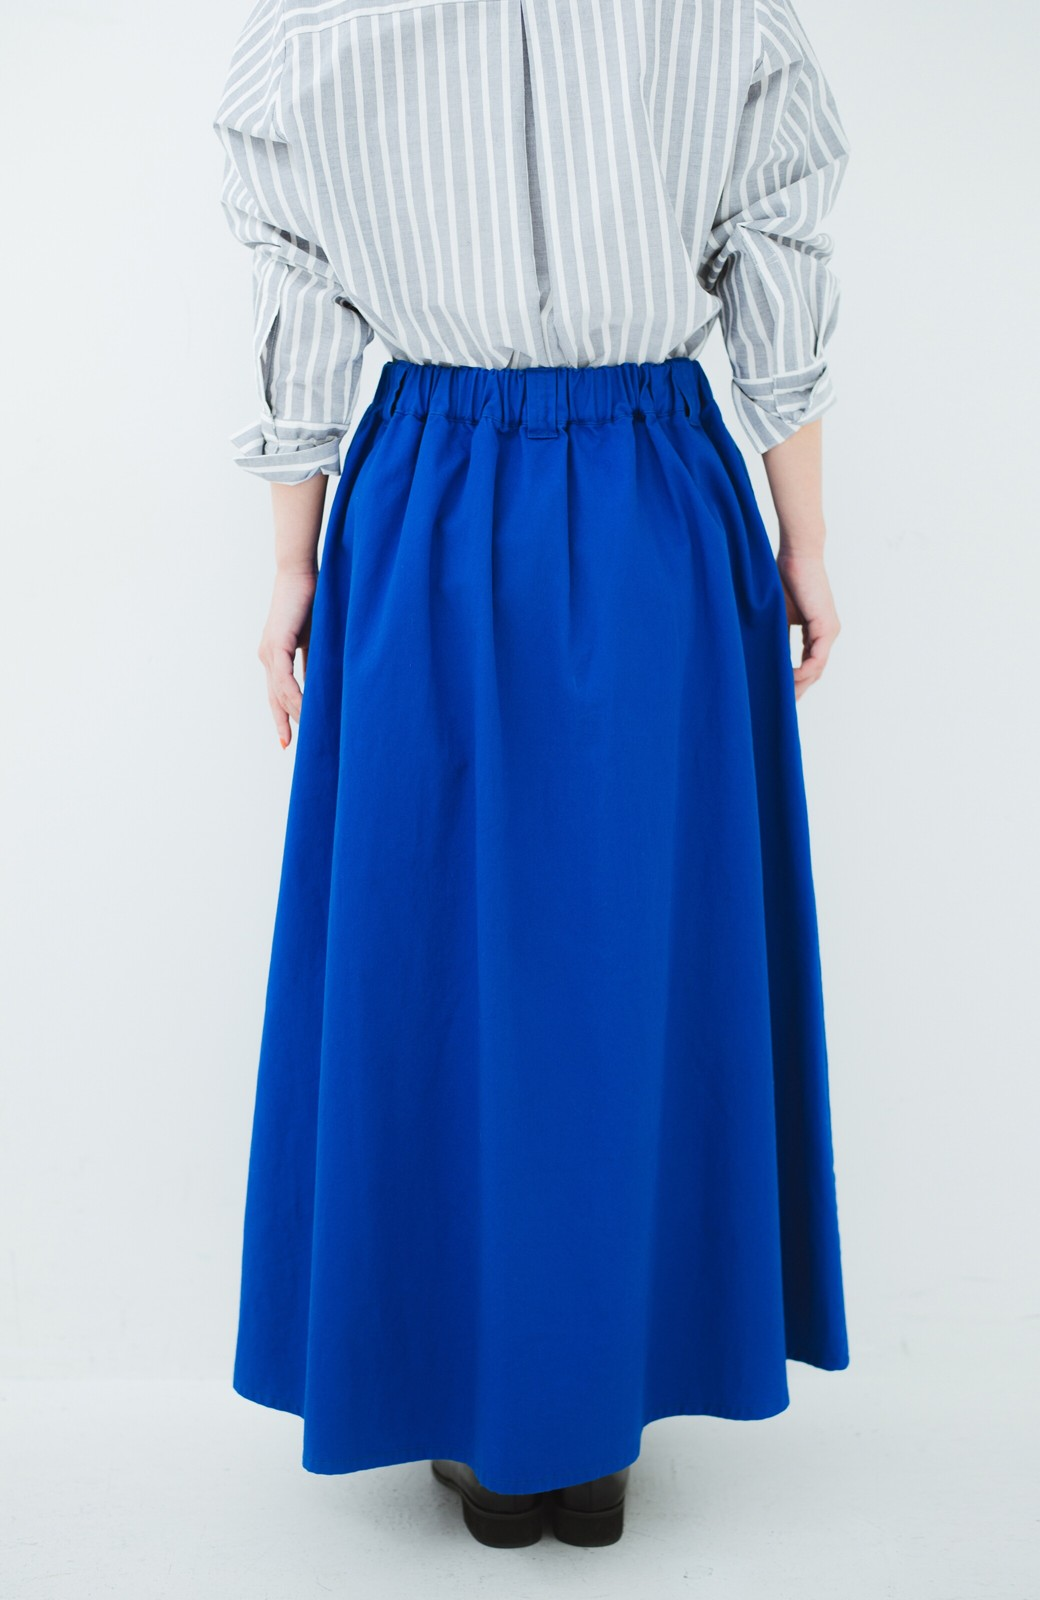 haco! 【今年も再販!】ロングシーズン楽しめる タックボリュームのチノロングスカート <ブルー>の商品写真7